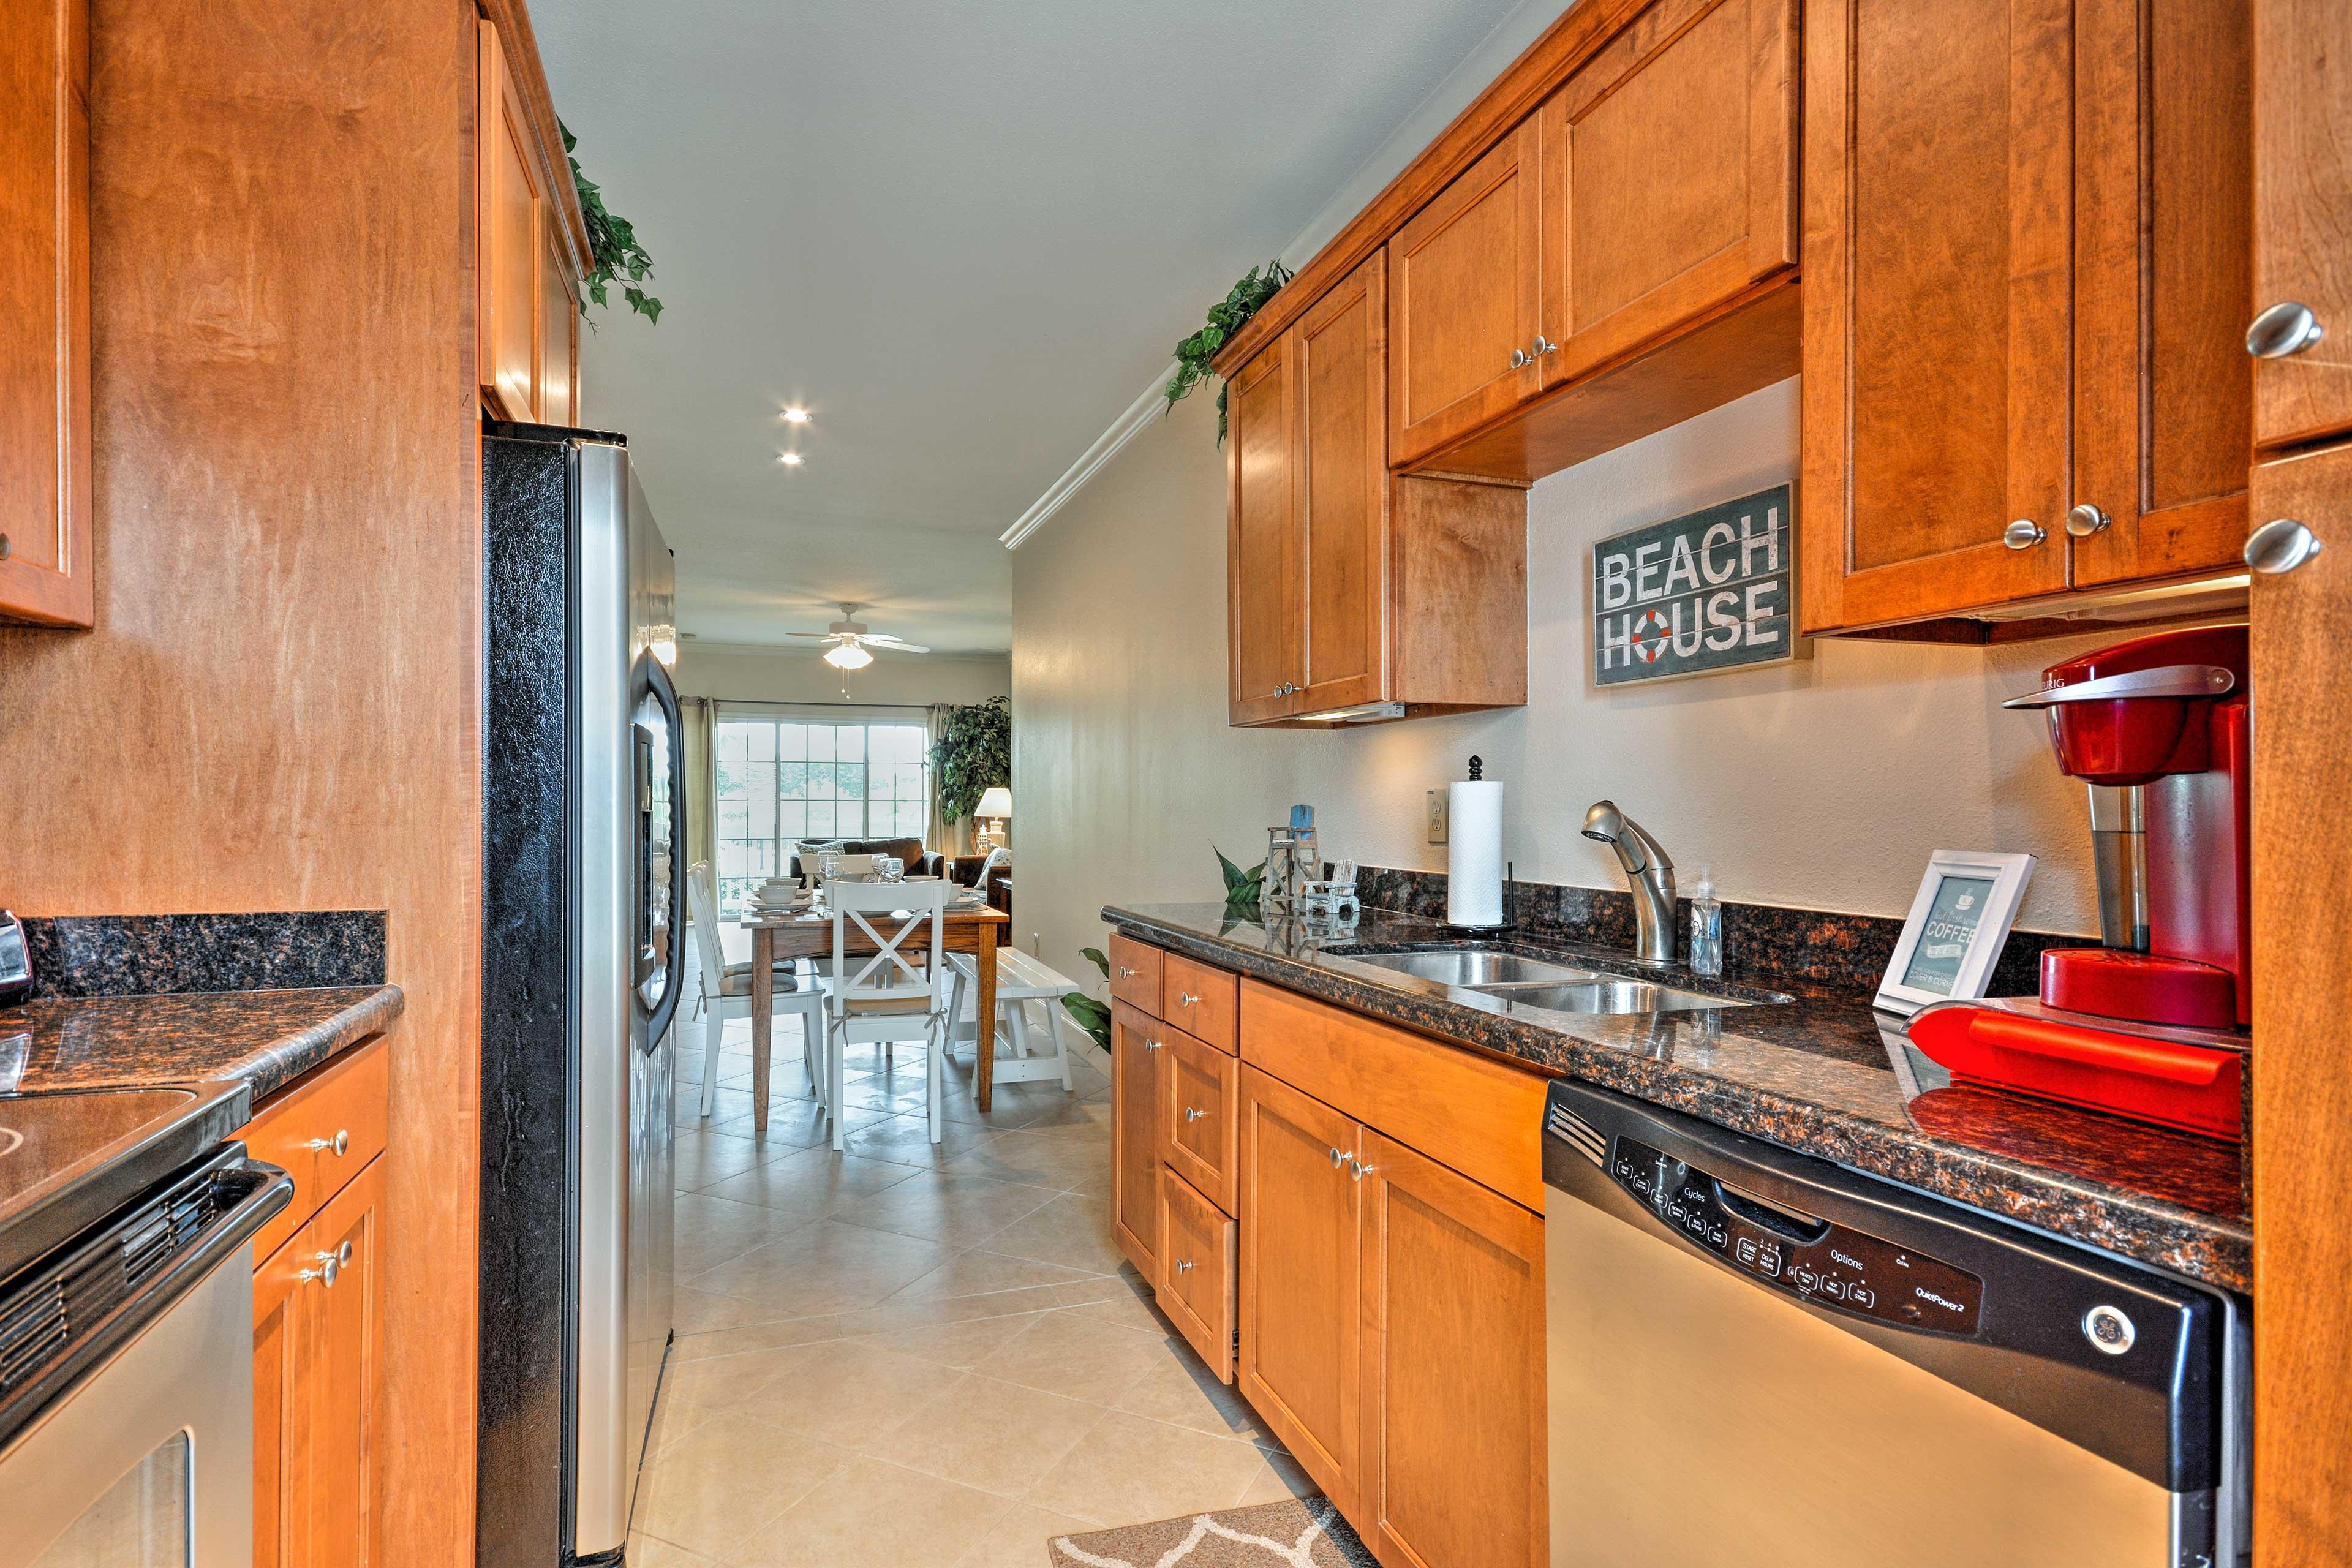 Kitchen | Blender | Dishwasher